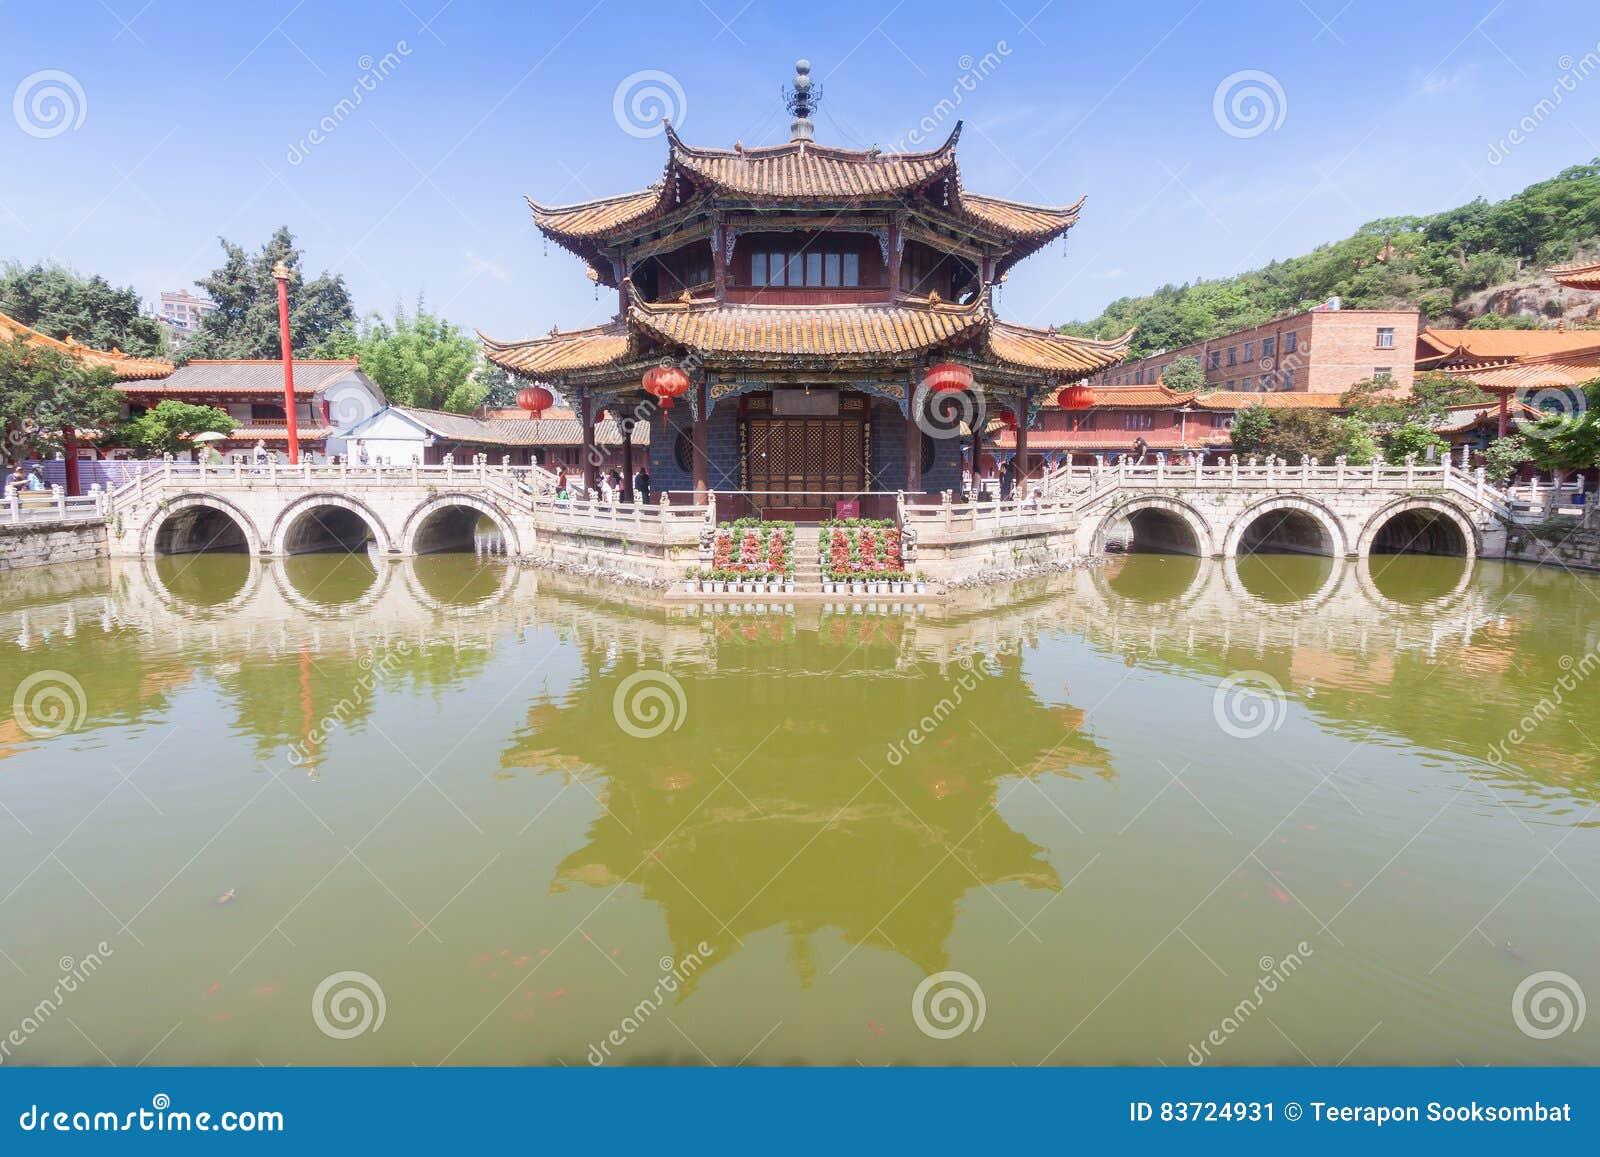 Yuantong Kunming Temple Stock Photo